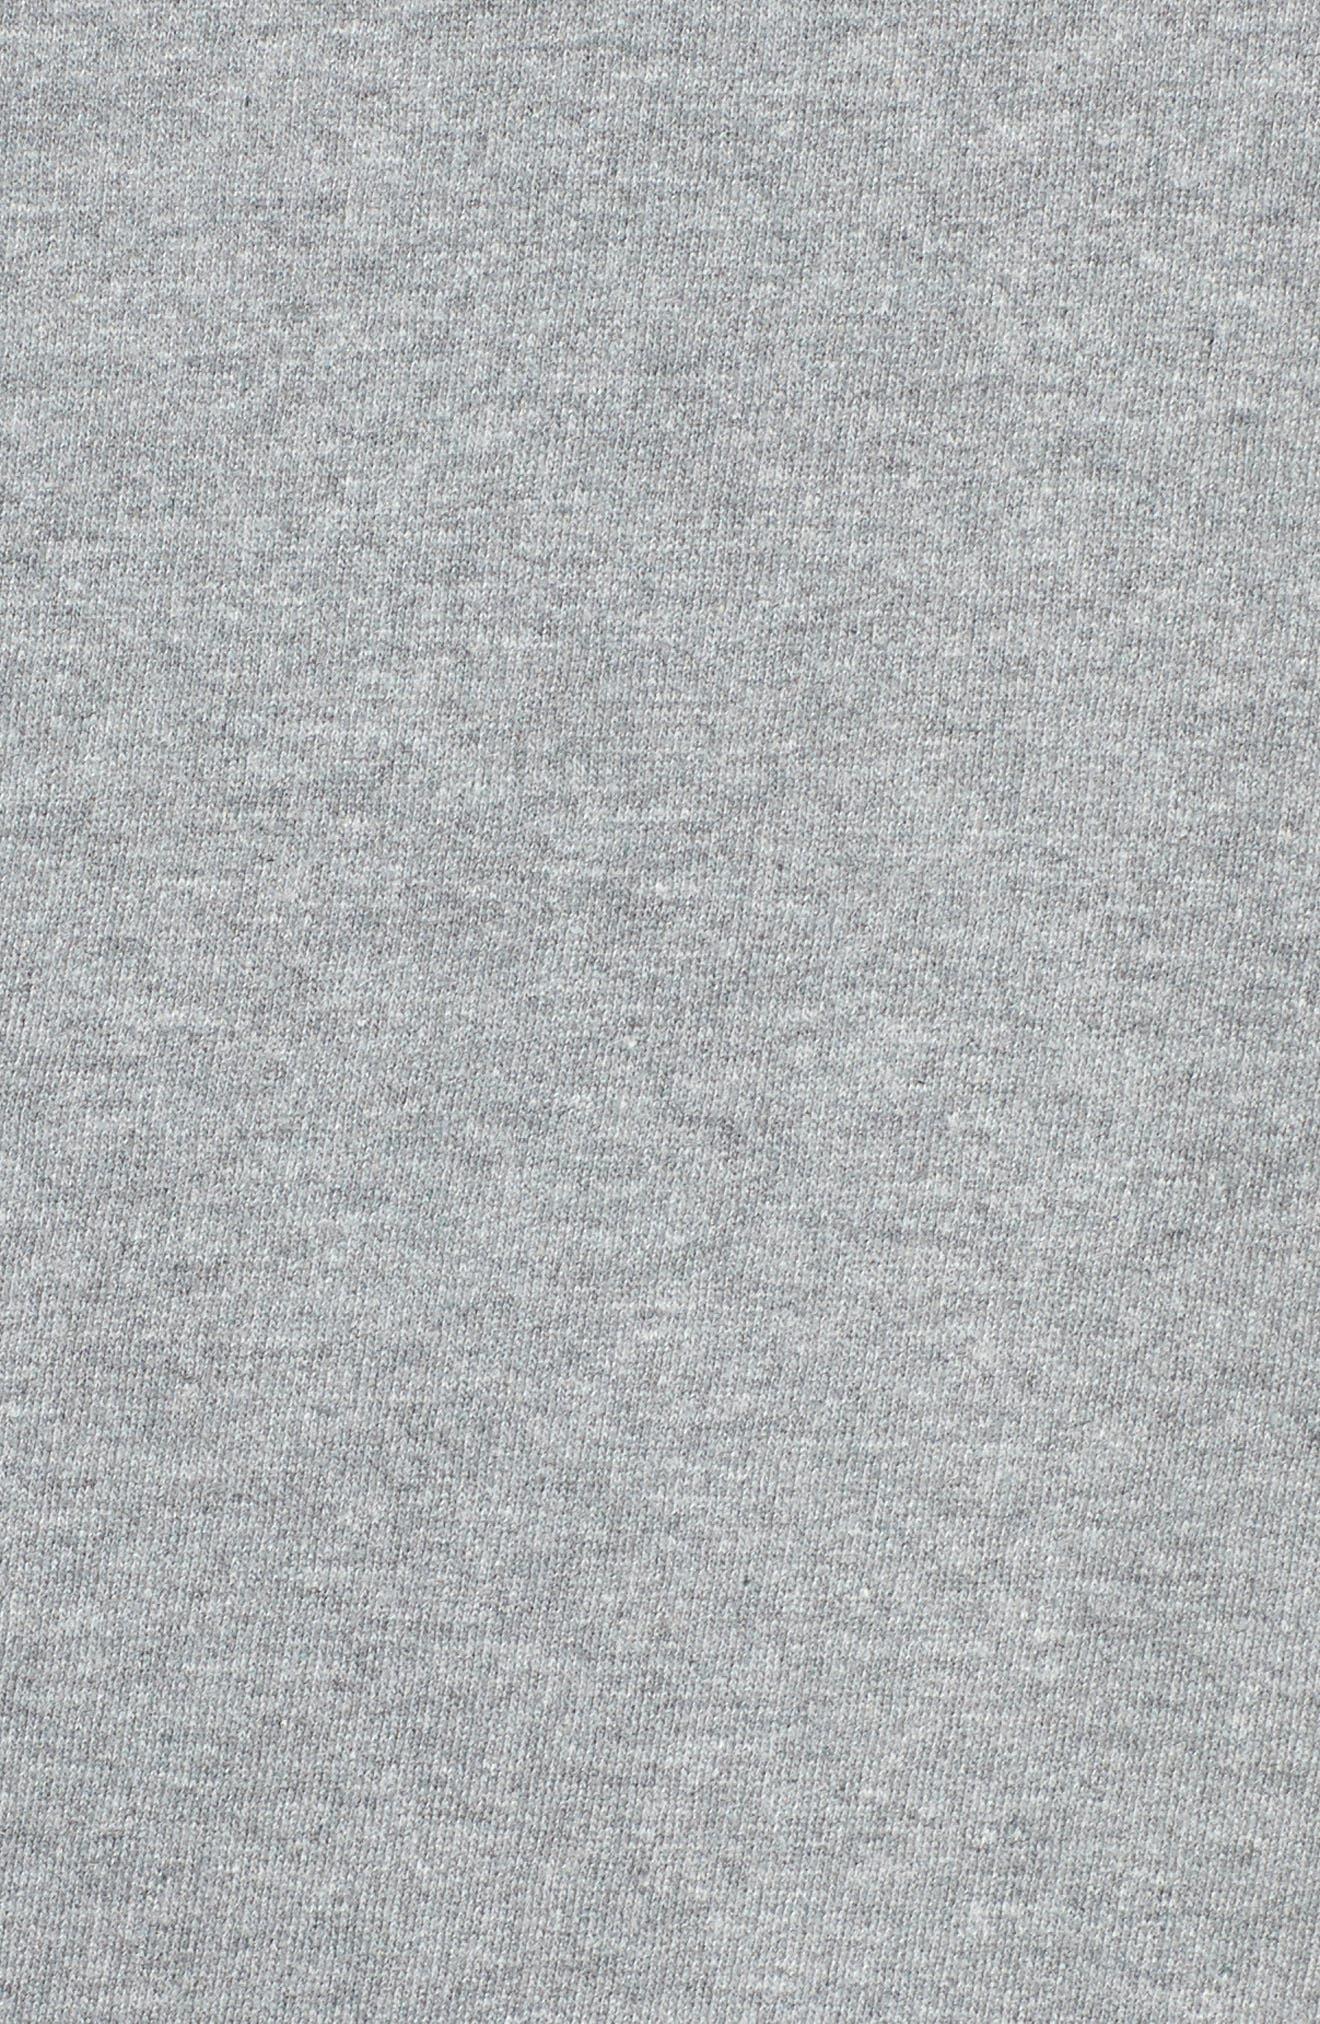 Brunette Crewneck Sweatshirt,                             Alternate thumbnail 5, color,                             Grey